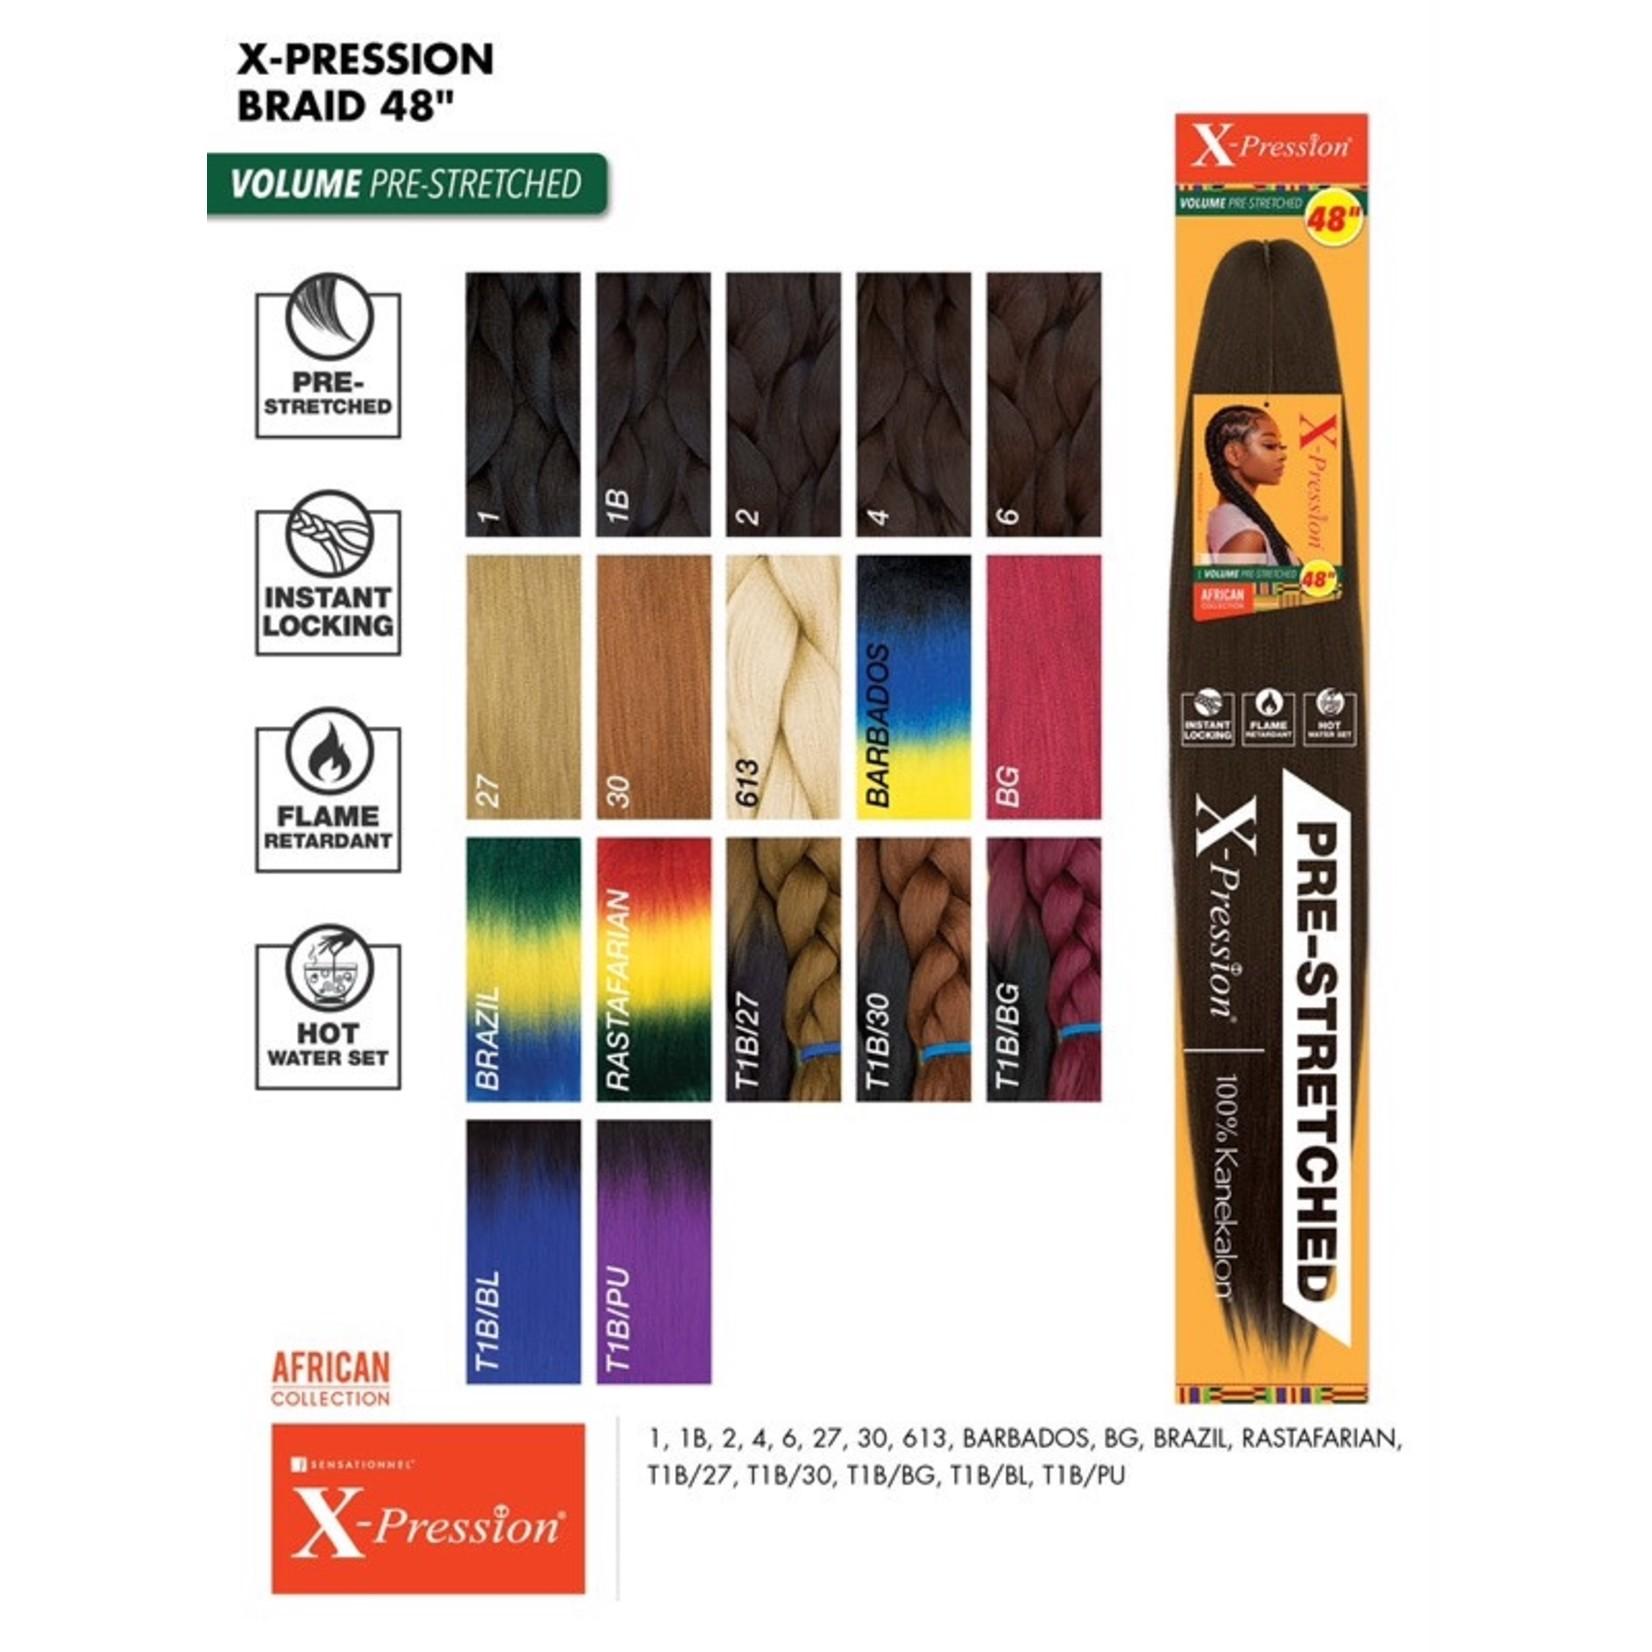 SENSATIONNEL X-Pression Volume Pre-Stretched Braid (48″)